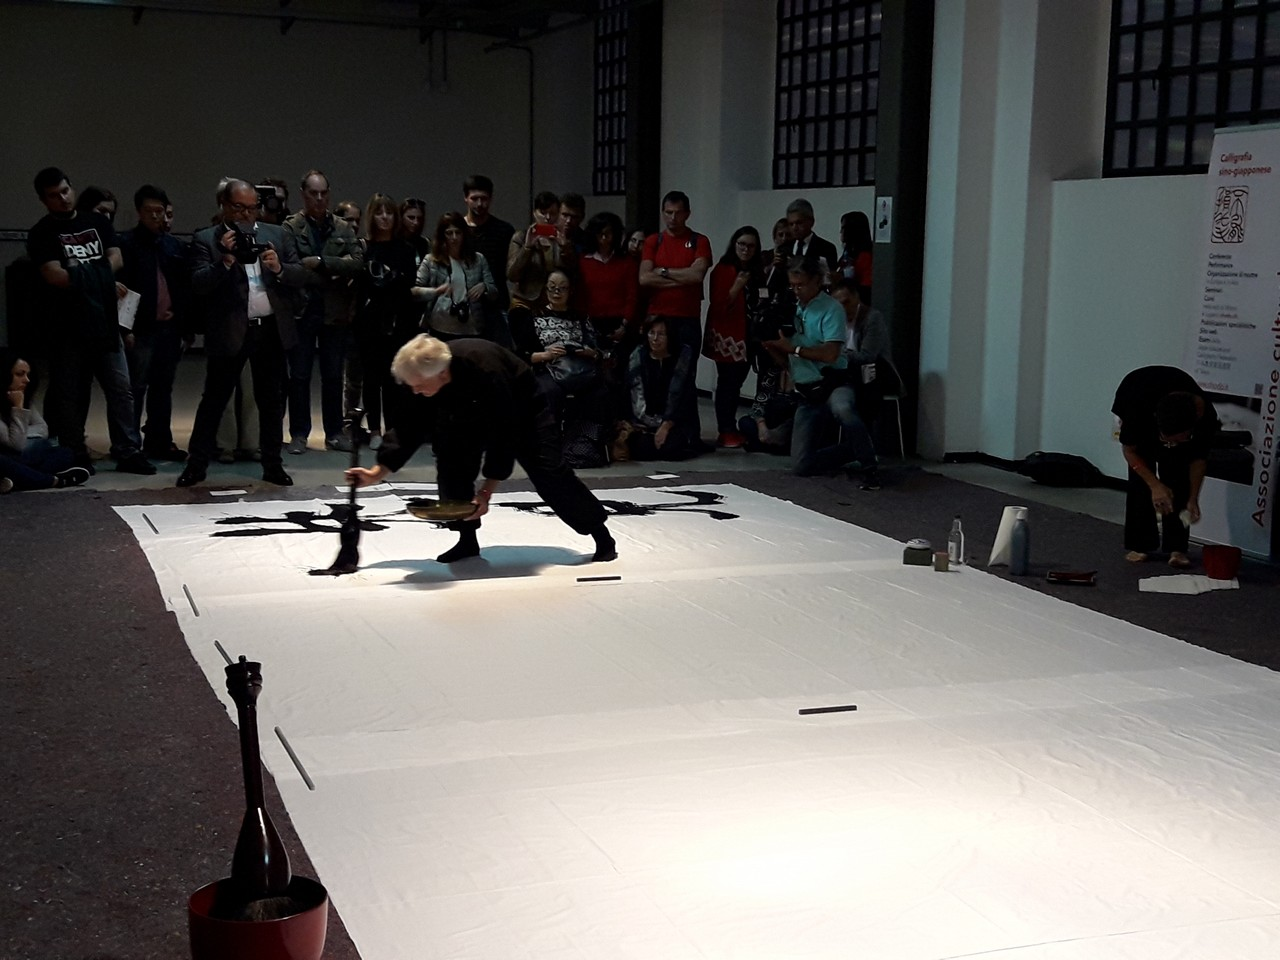 JapanFestival-Milano2018-fotoPagineZeni_011